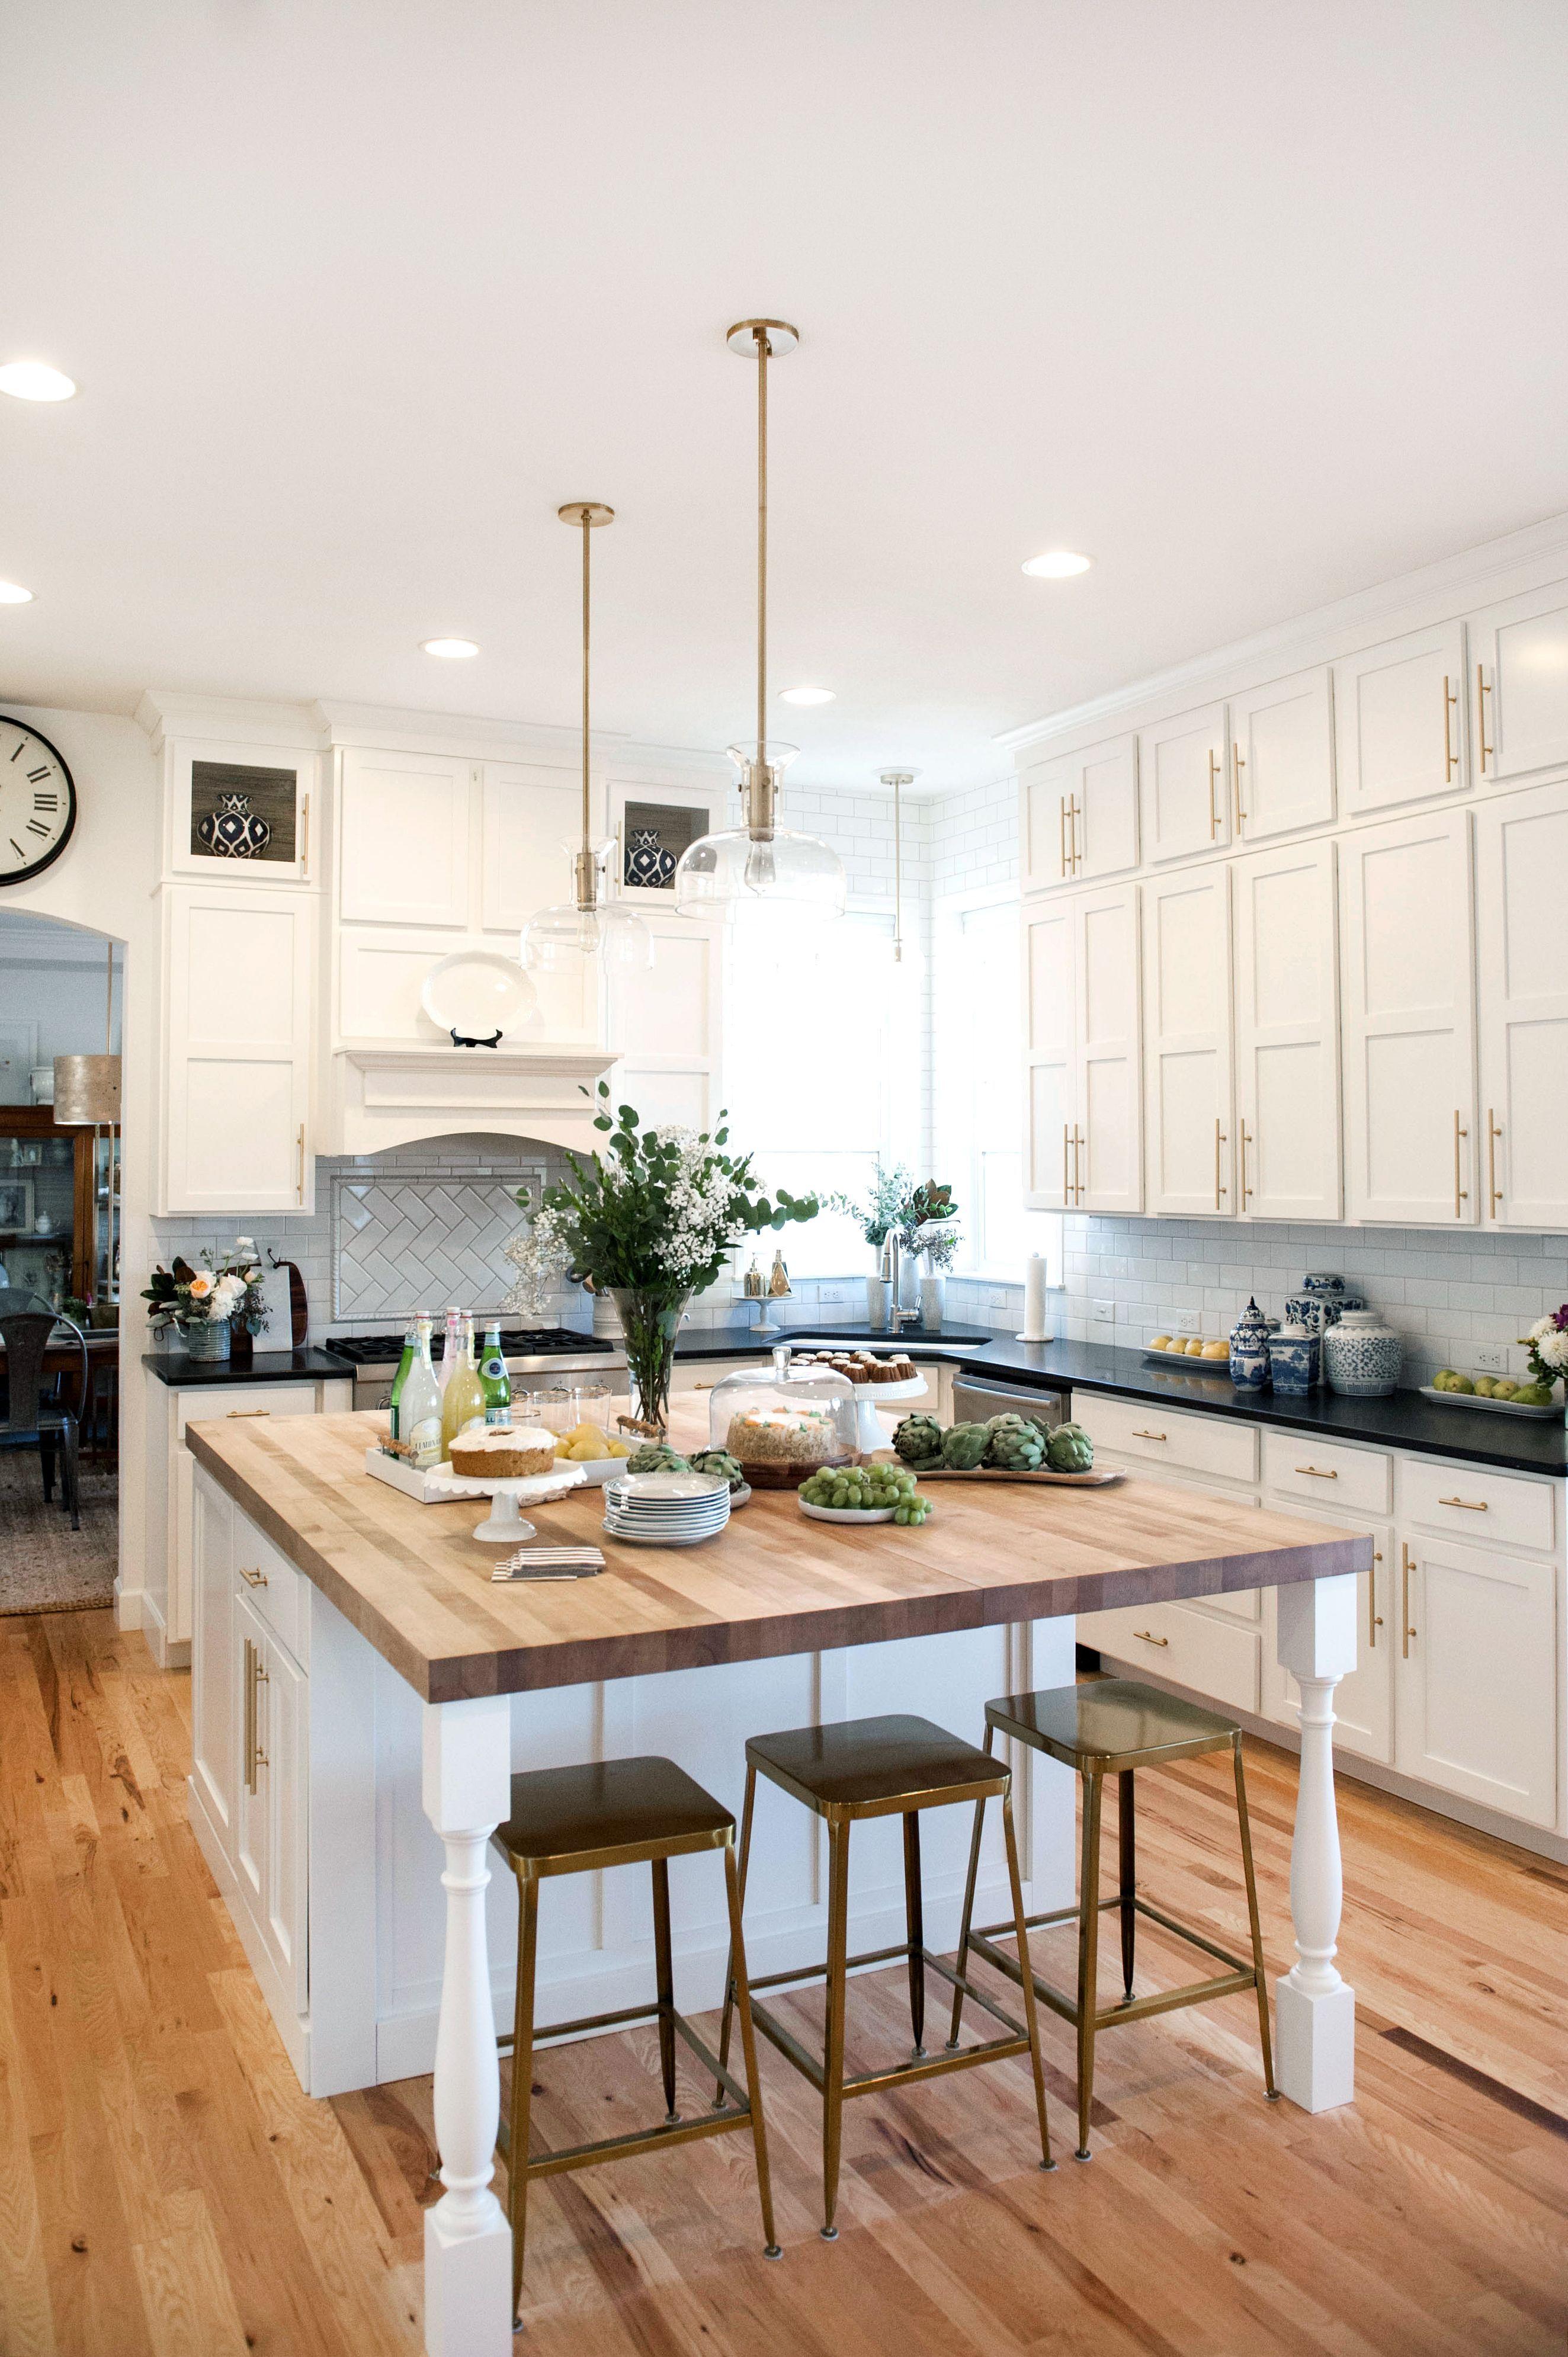 Suburban B S Fall 2016 One Room Challenge White Kitchen Makeover White Kitchen Cabinets Bras White Kitchen Makeover Home Kitchens Kitchen Island With Seating